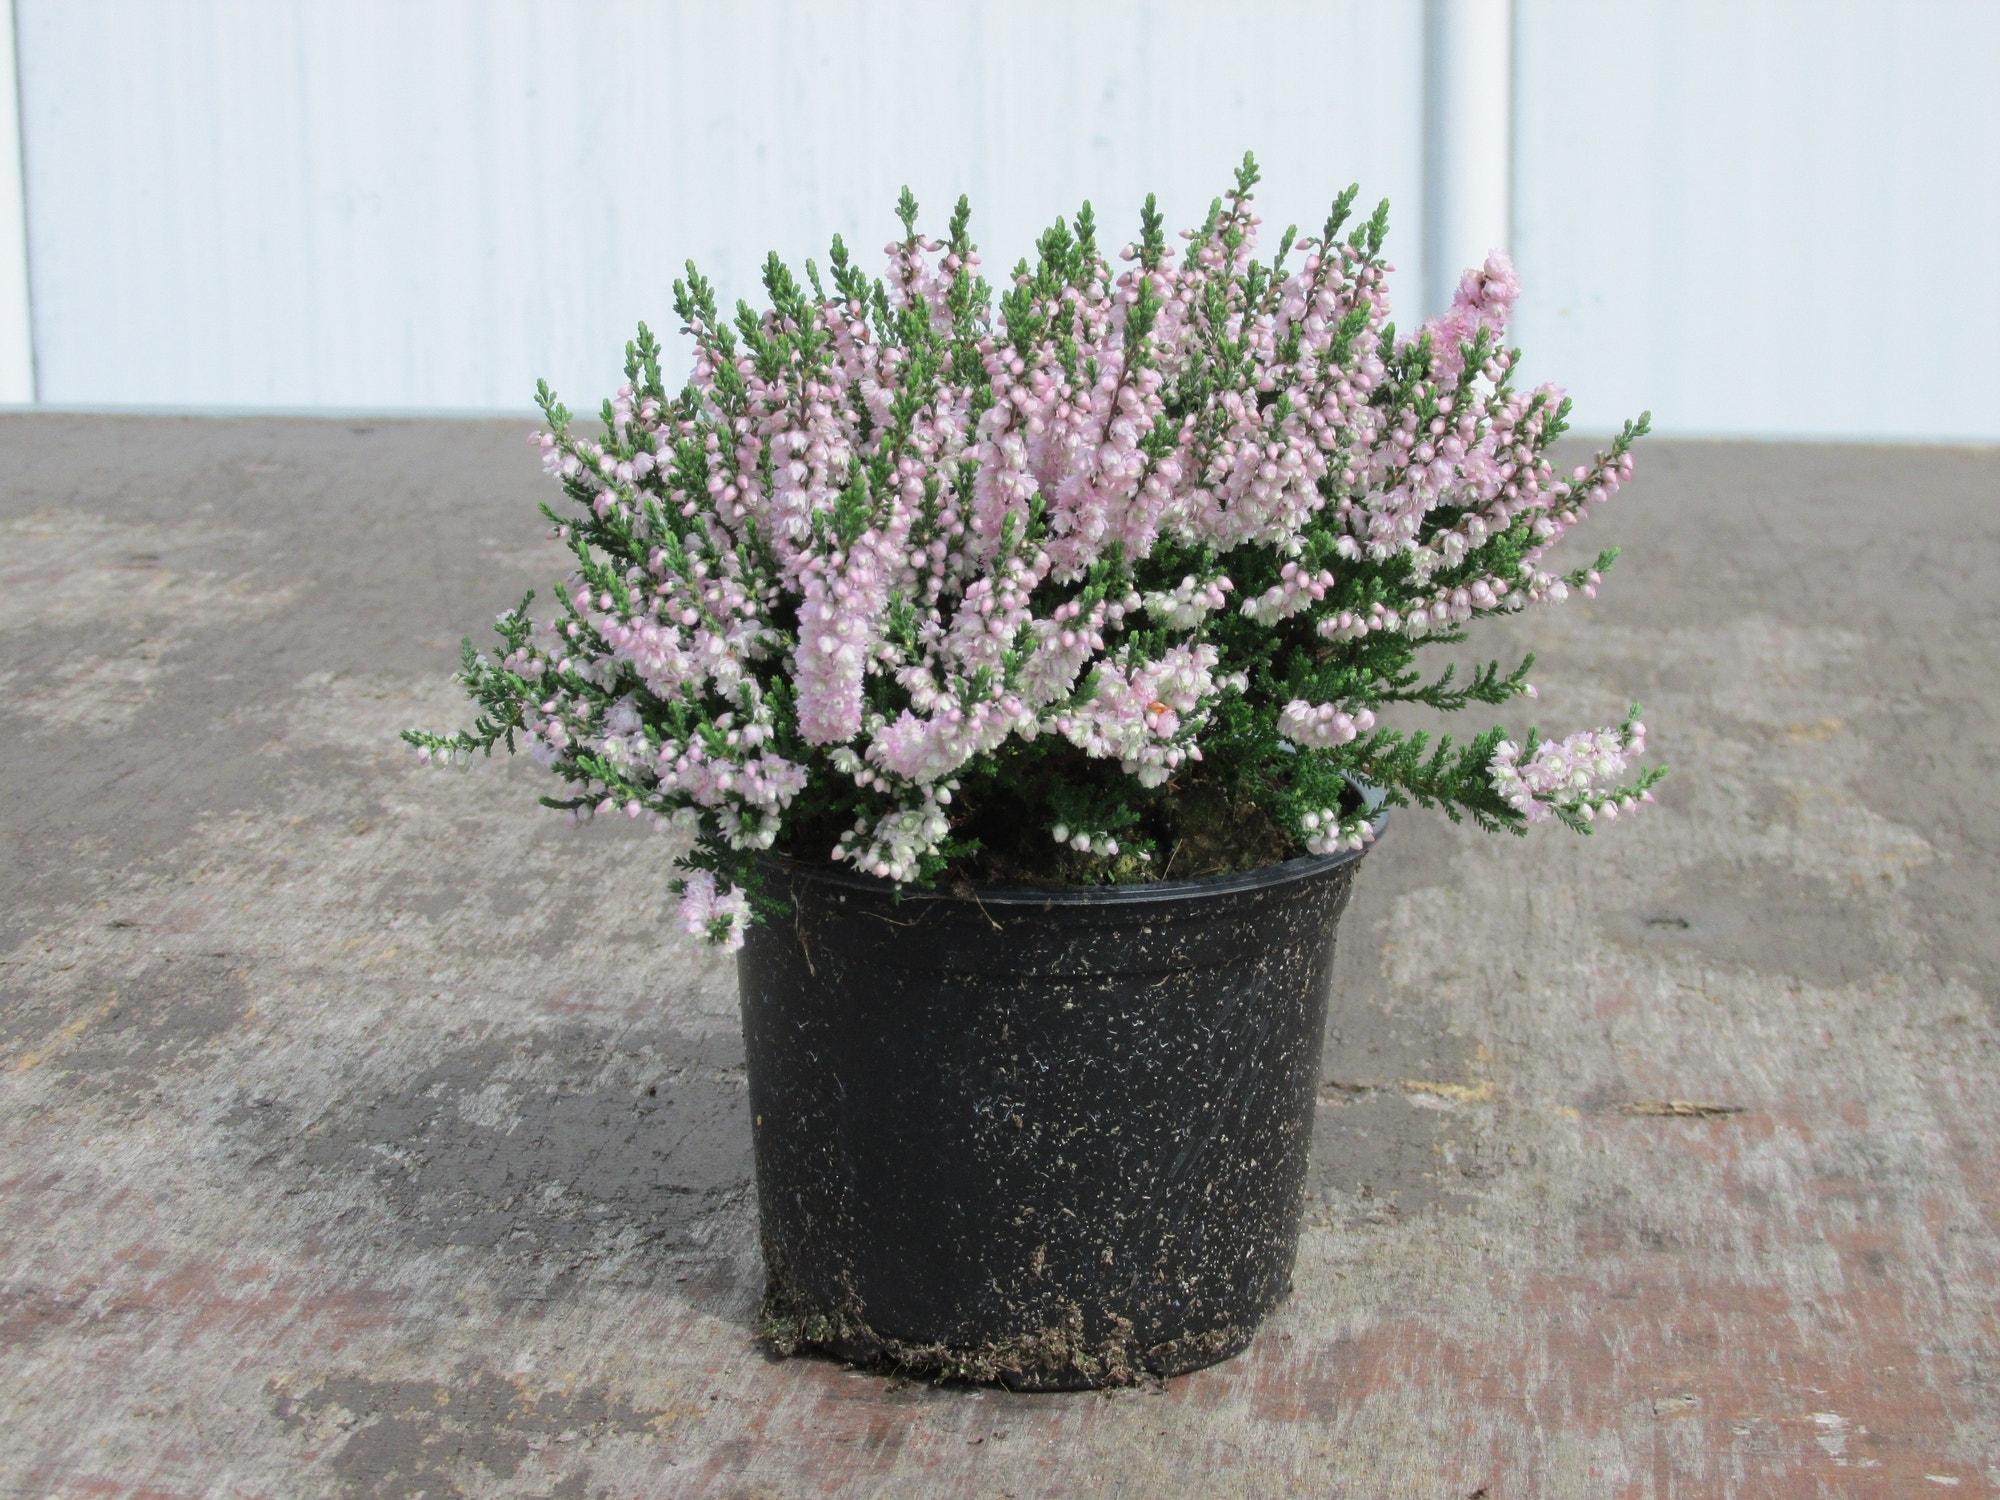 Struikheide (Calluna vulgaris 'Radnor') P12. Kleur: paars